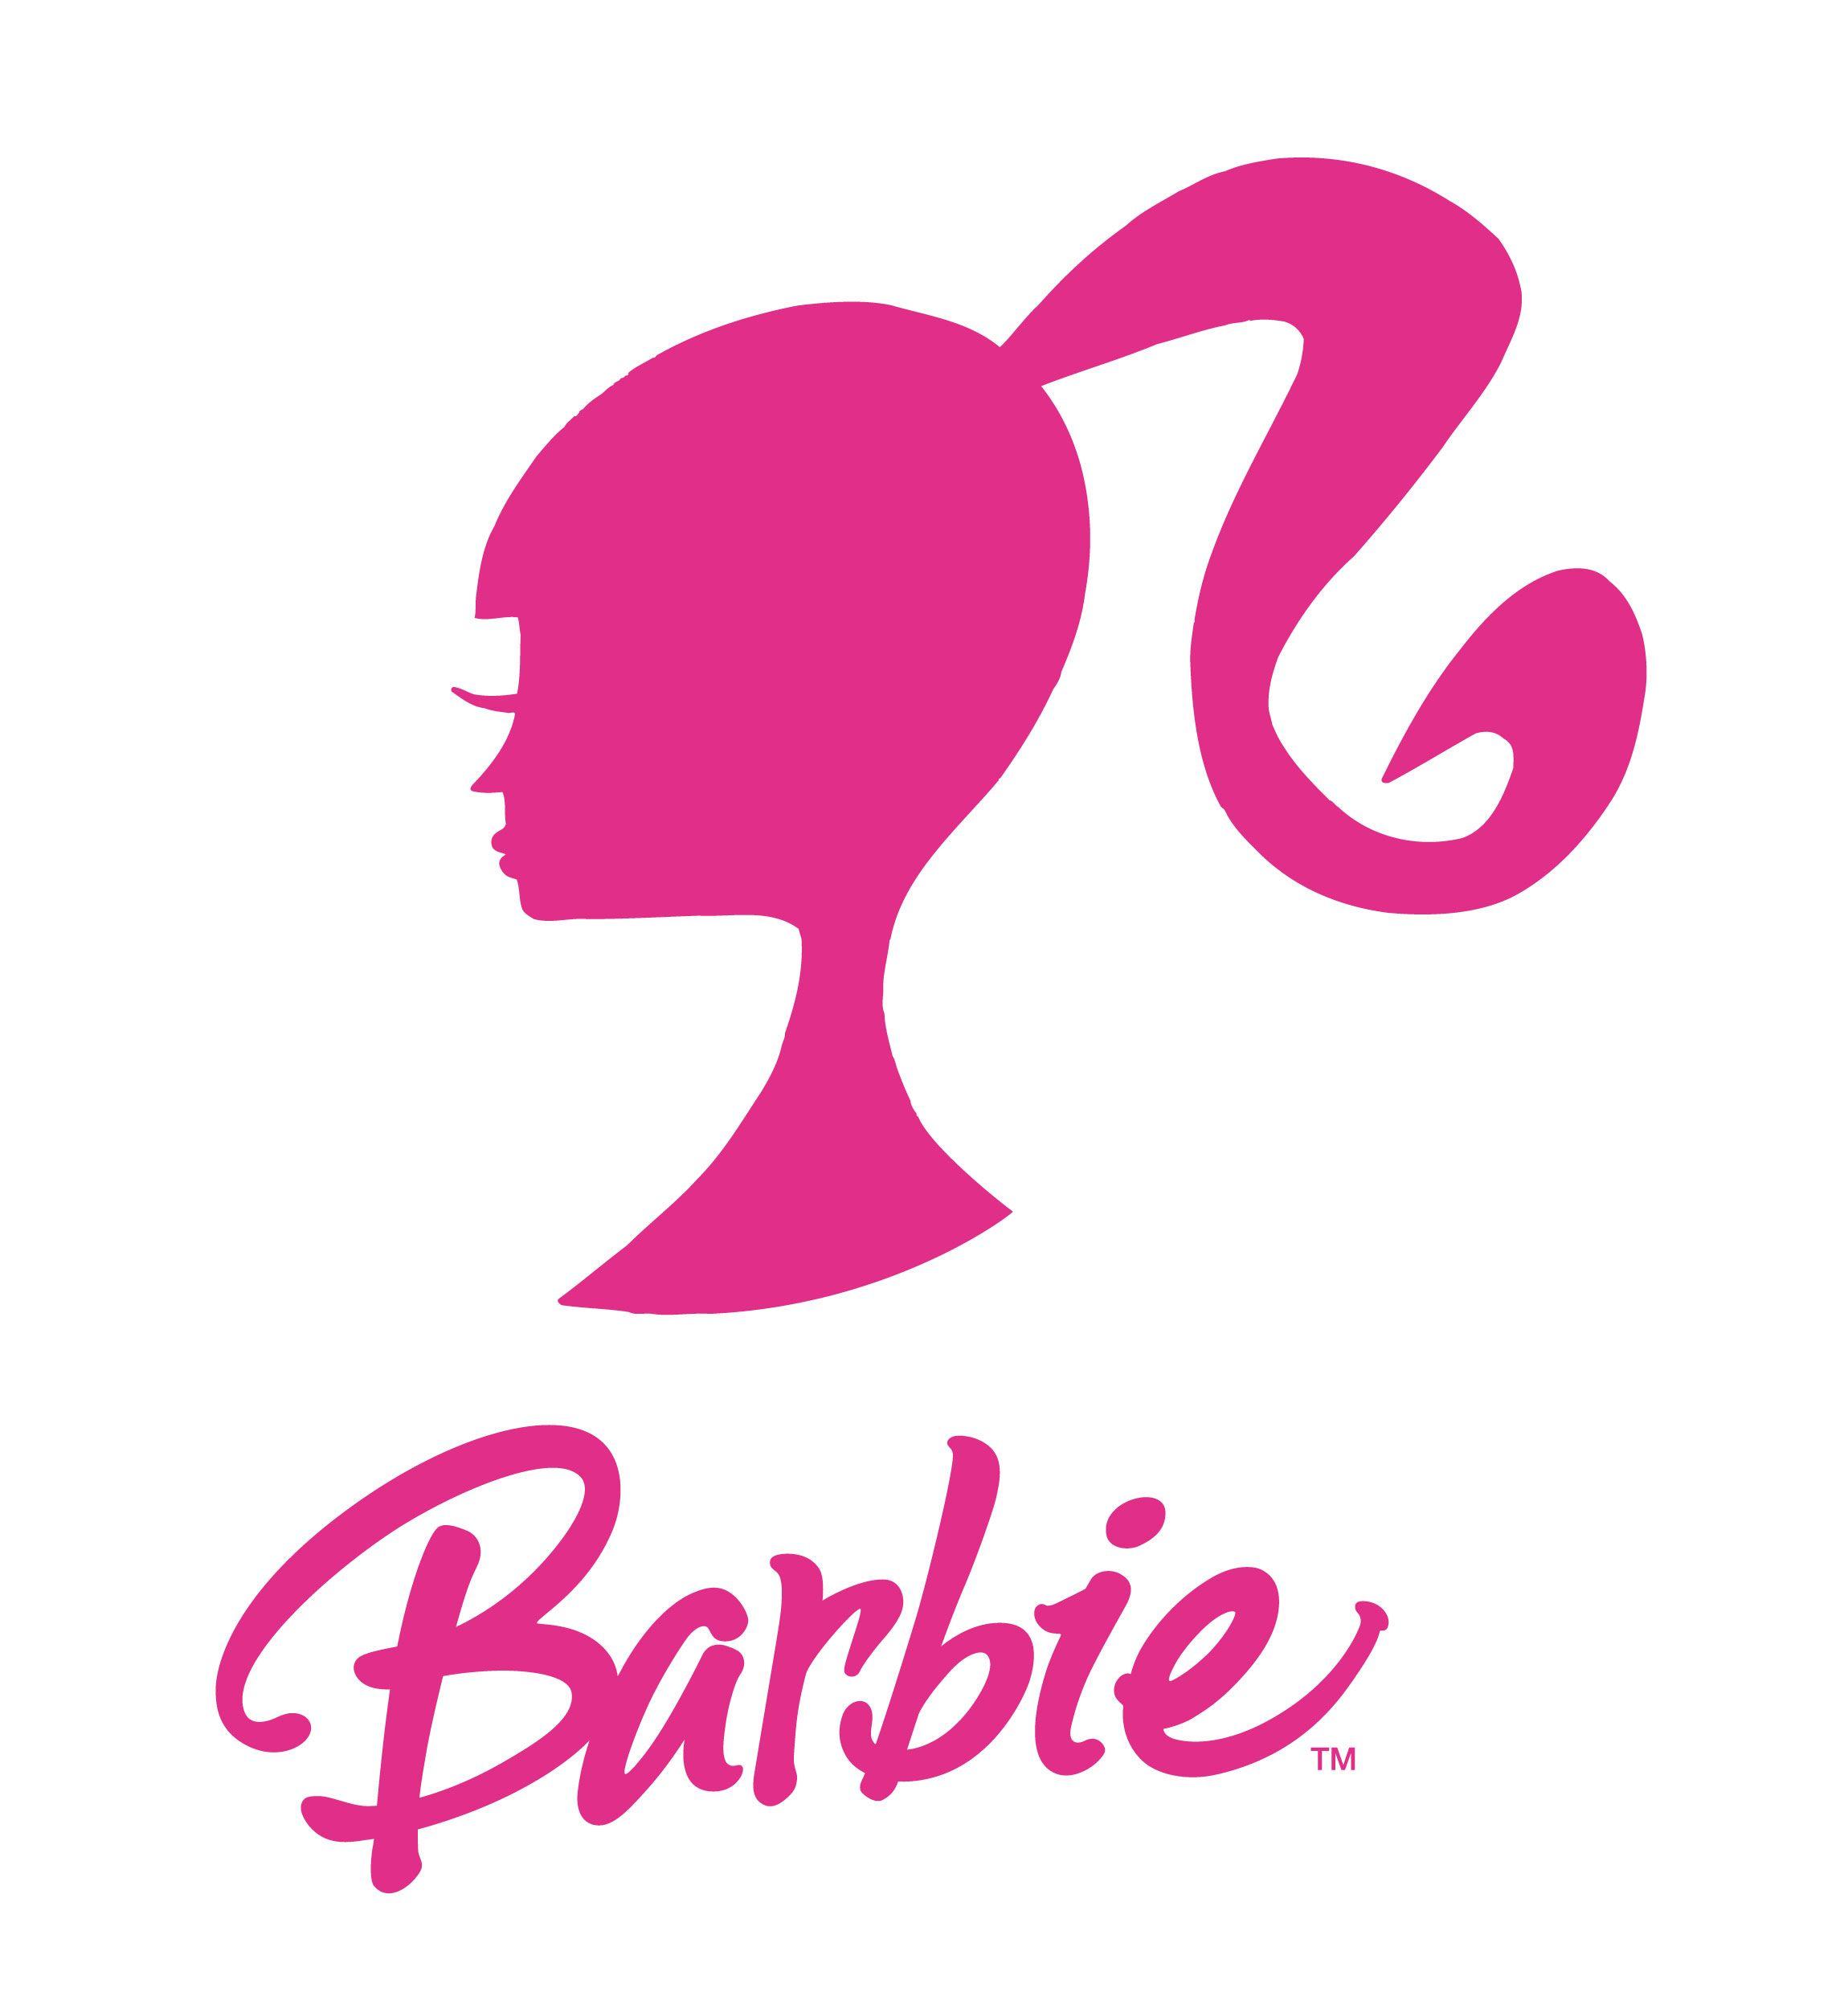 Barbie Logo Pretty in Pink Pinterest Logos